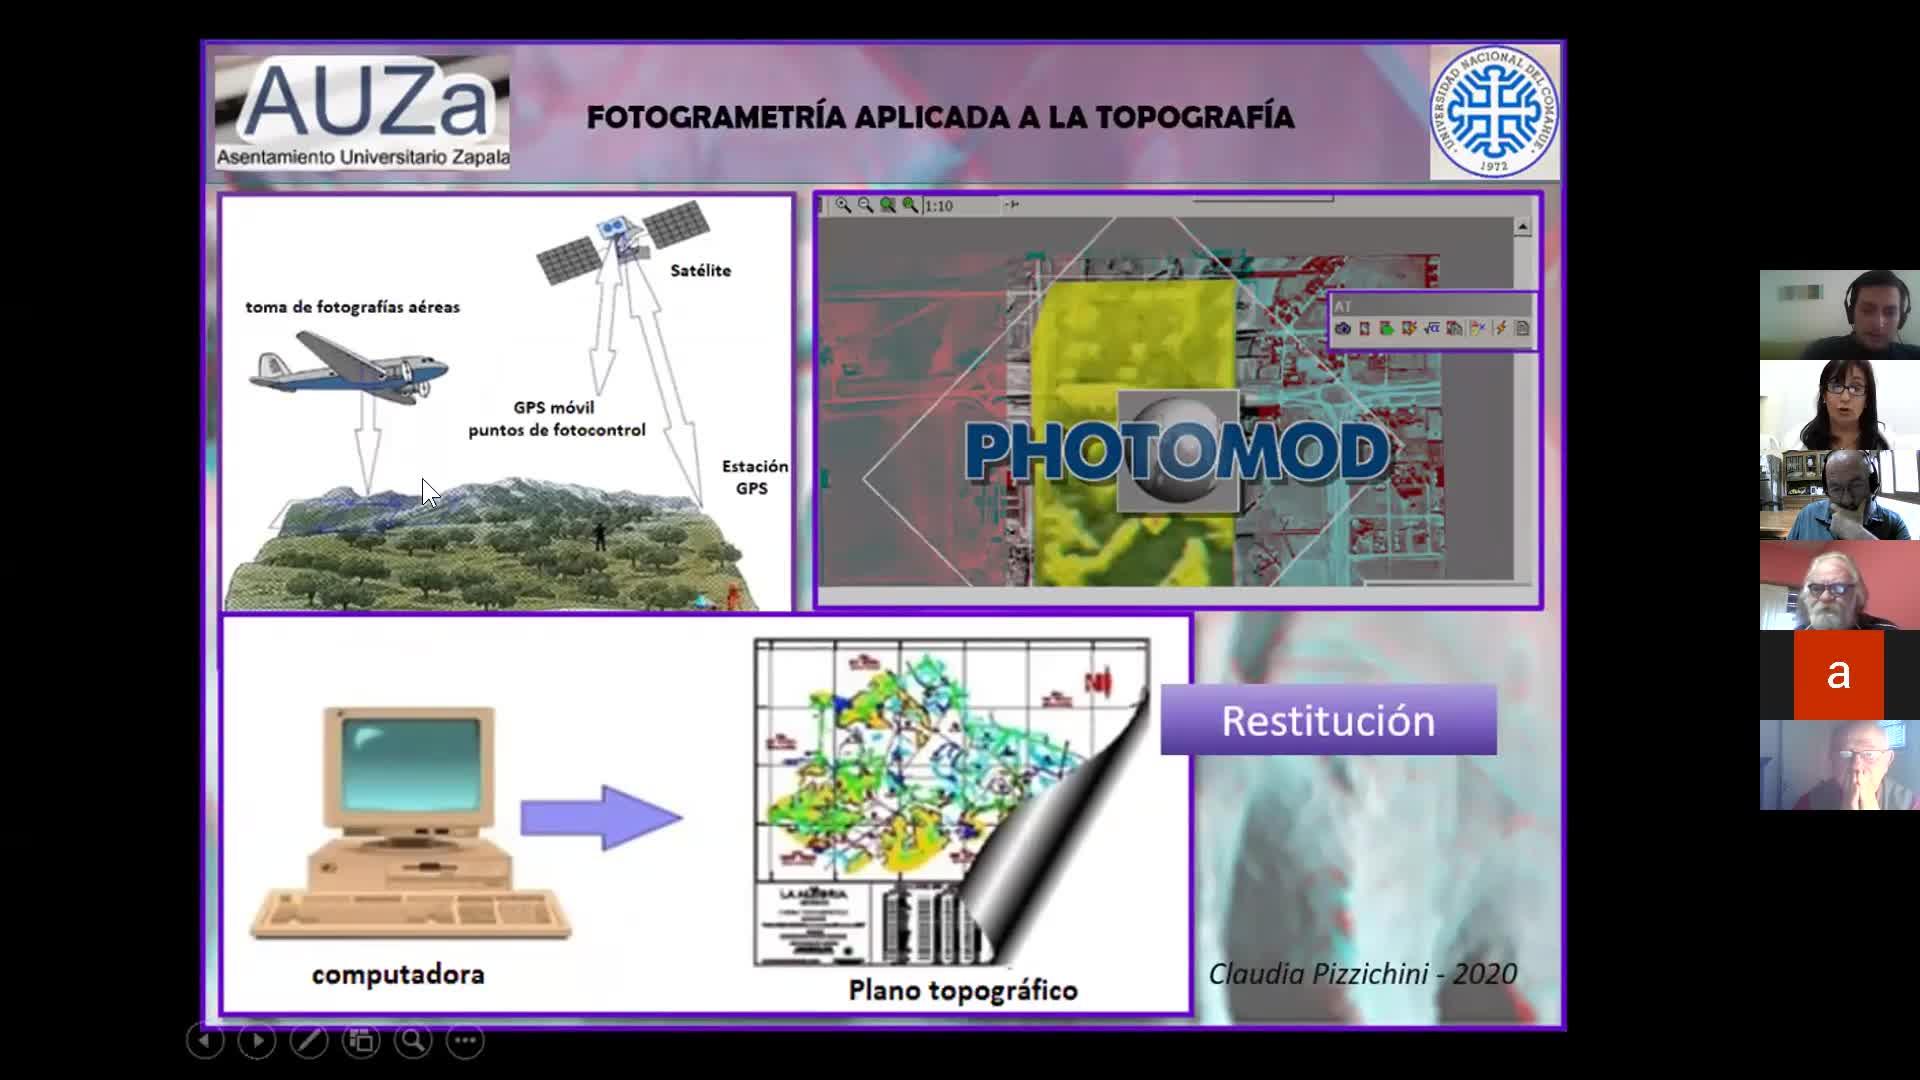 Fotogrametria aplicada a la topografia. Ariel Vargas Claudia Pizzichini